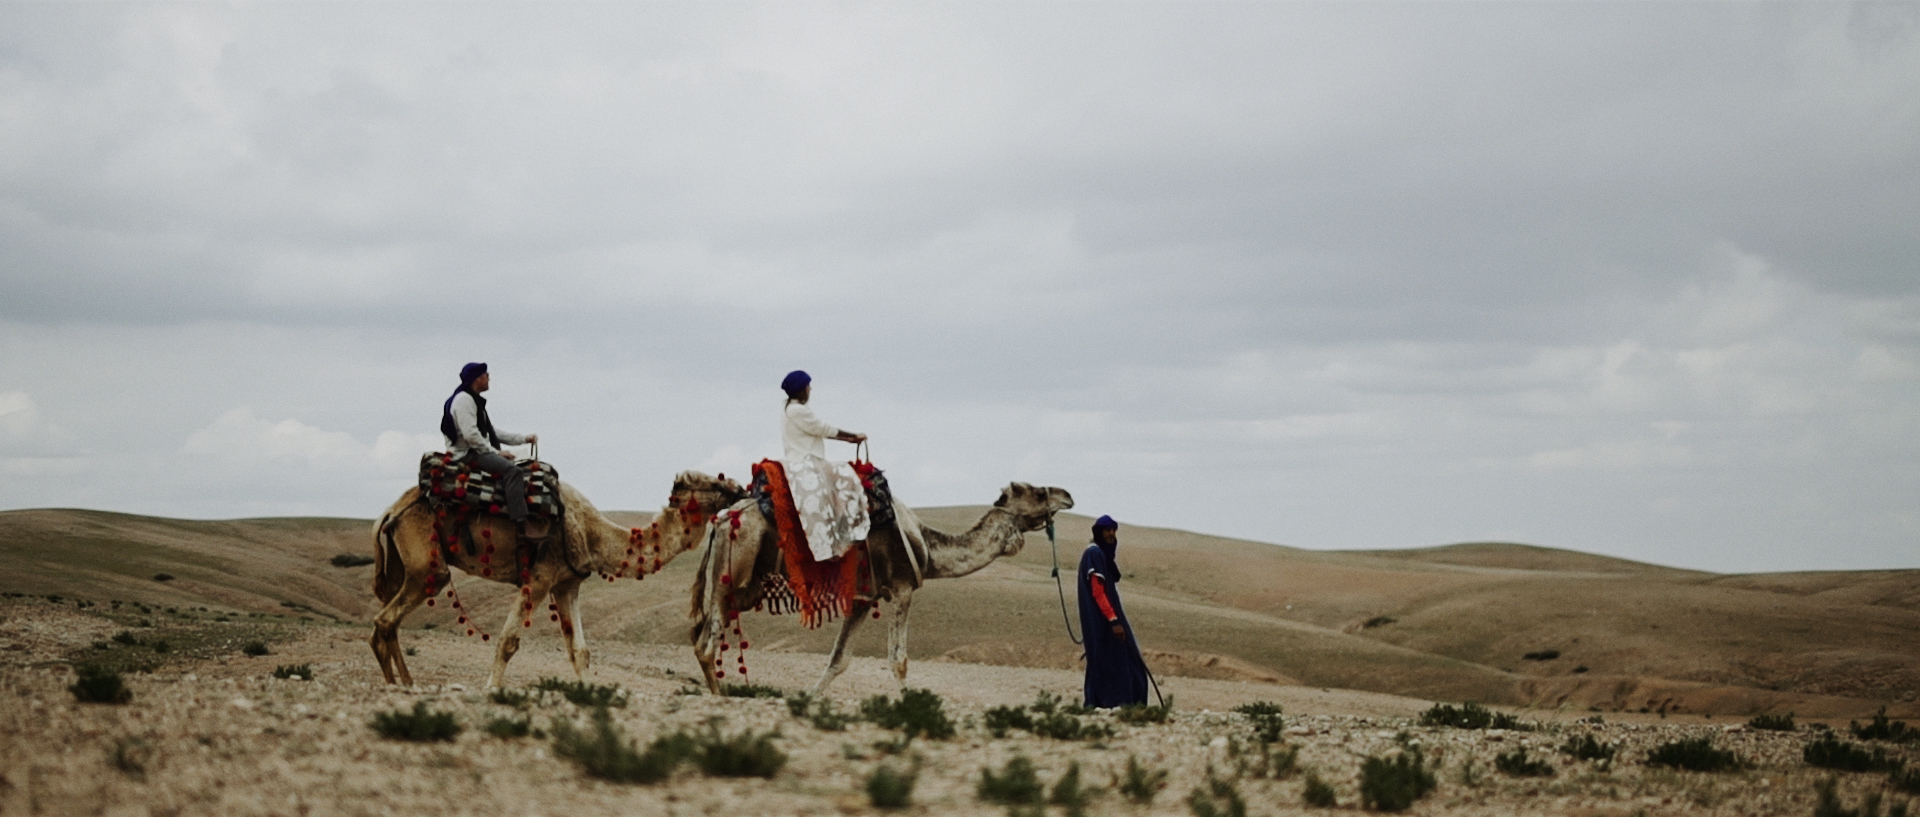 Jessica + Darren | Marrakesh, Morocco | Ksar Char Bagh